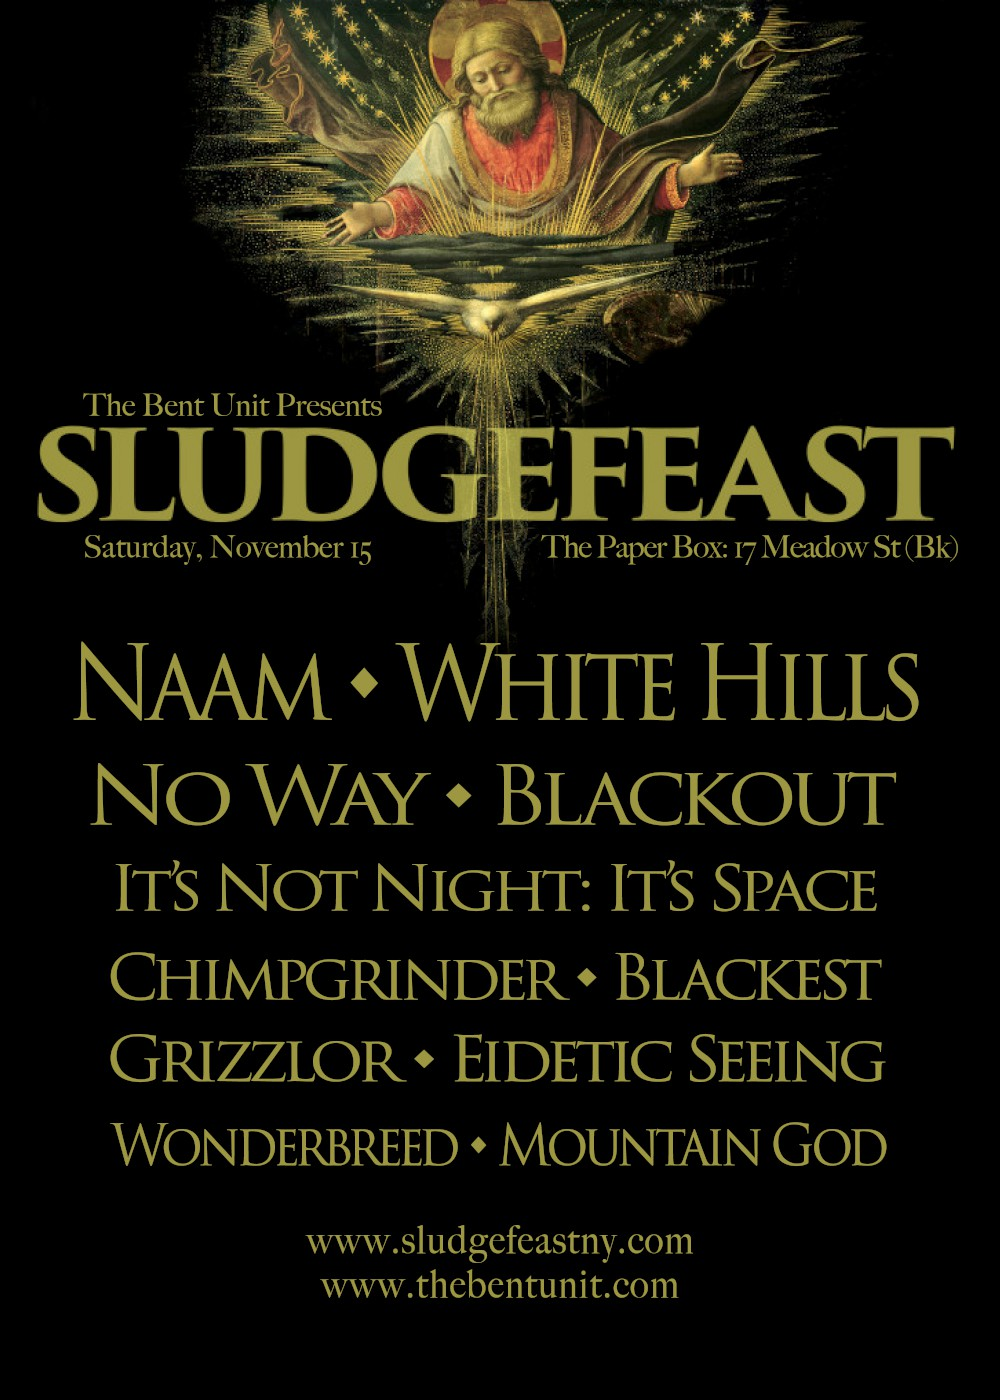 sludgefeast poster